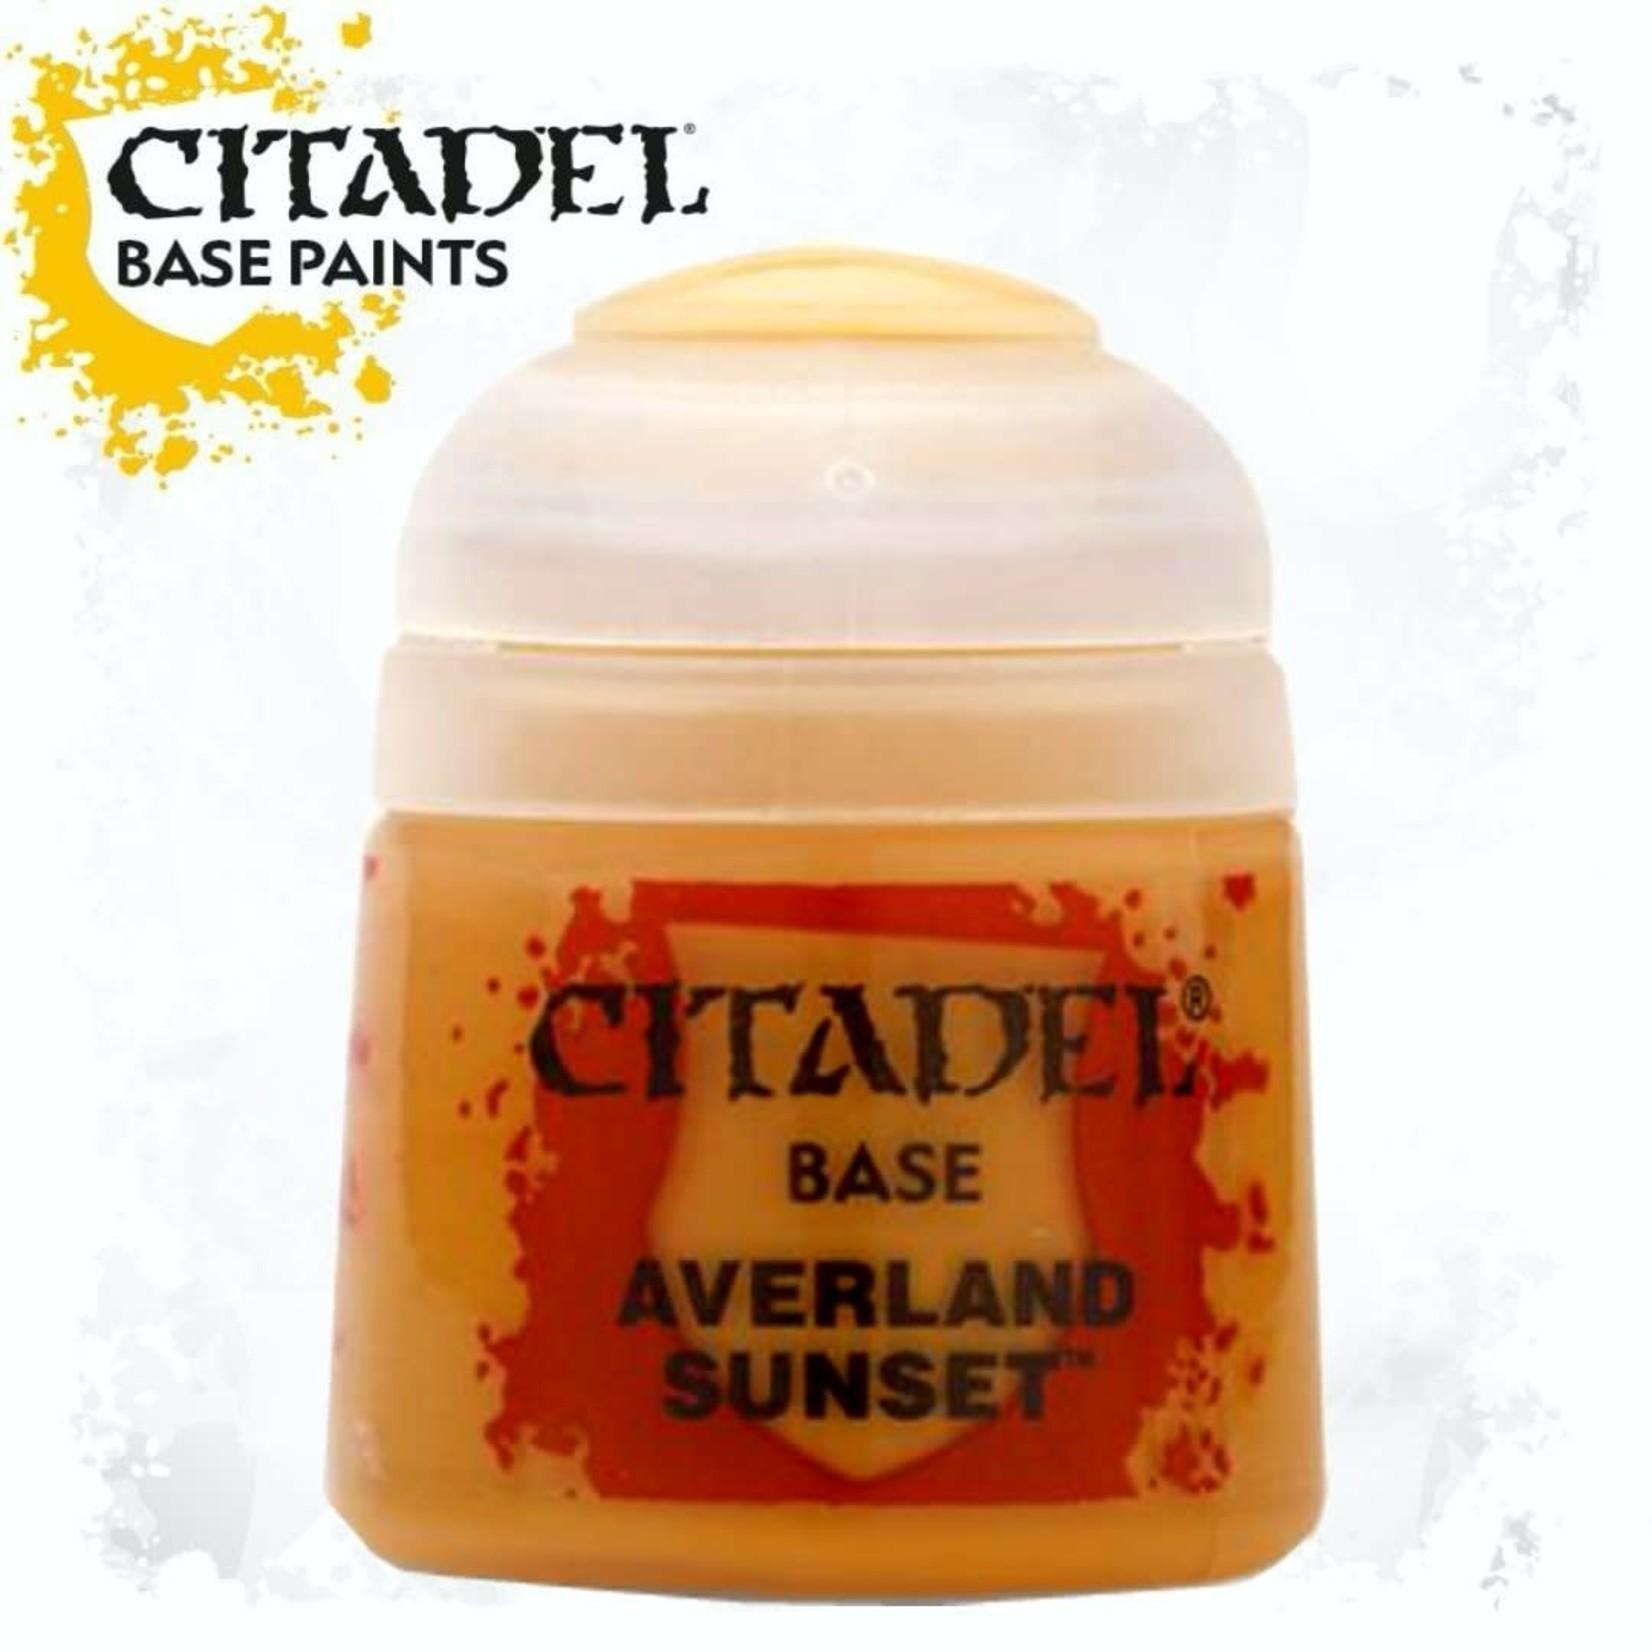 Citadel Citadel Paint - Base: Averland Sunset